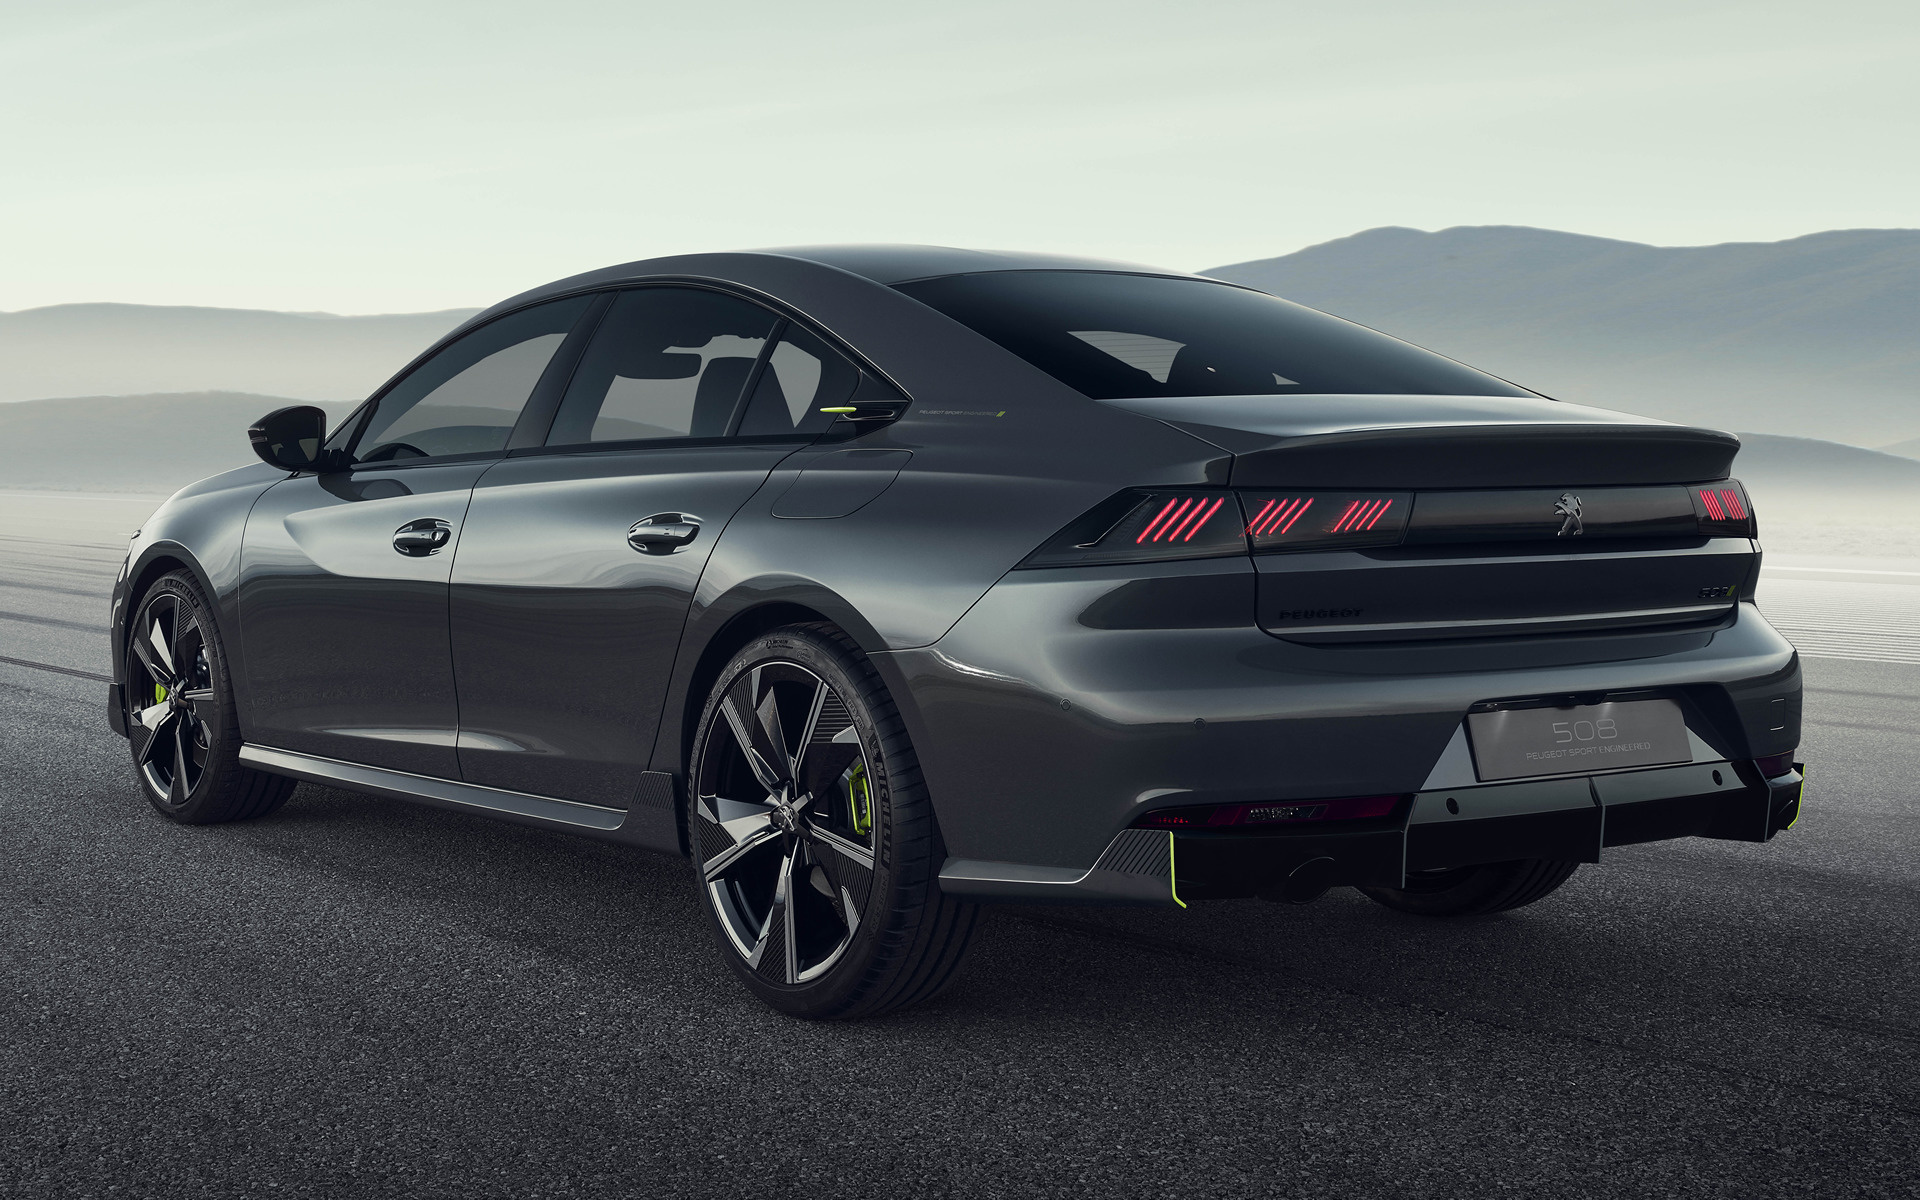 2019 Concept 508 Peugeot Sport Engineered